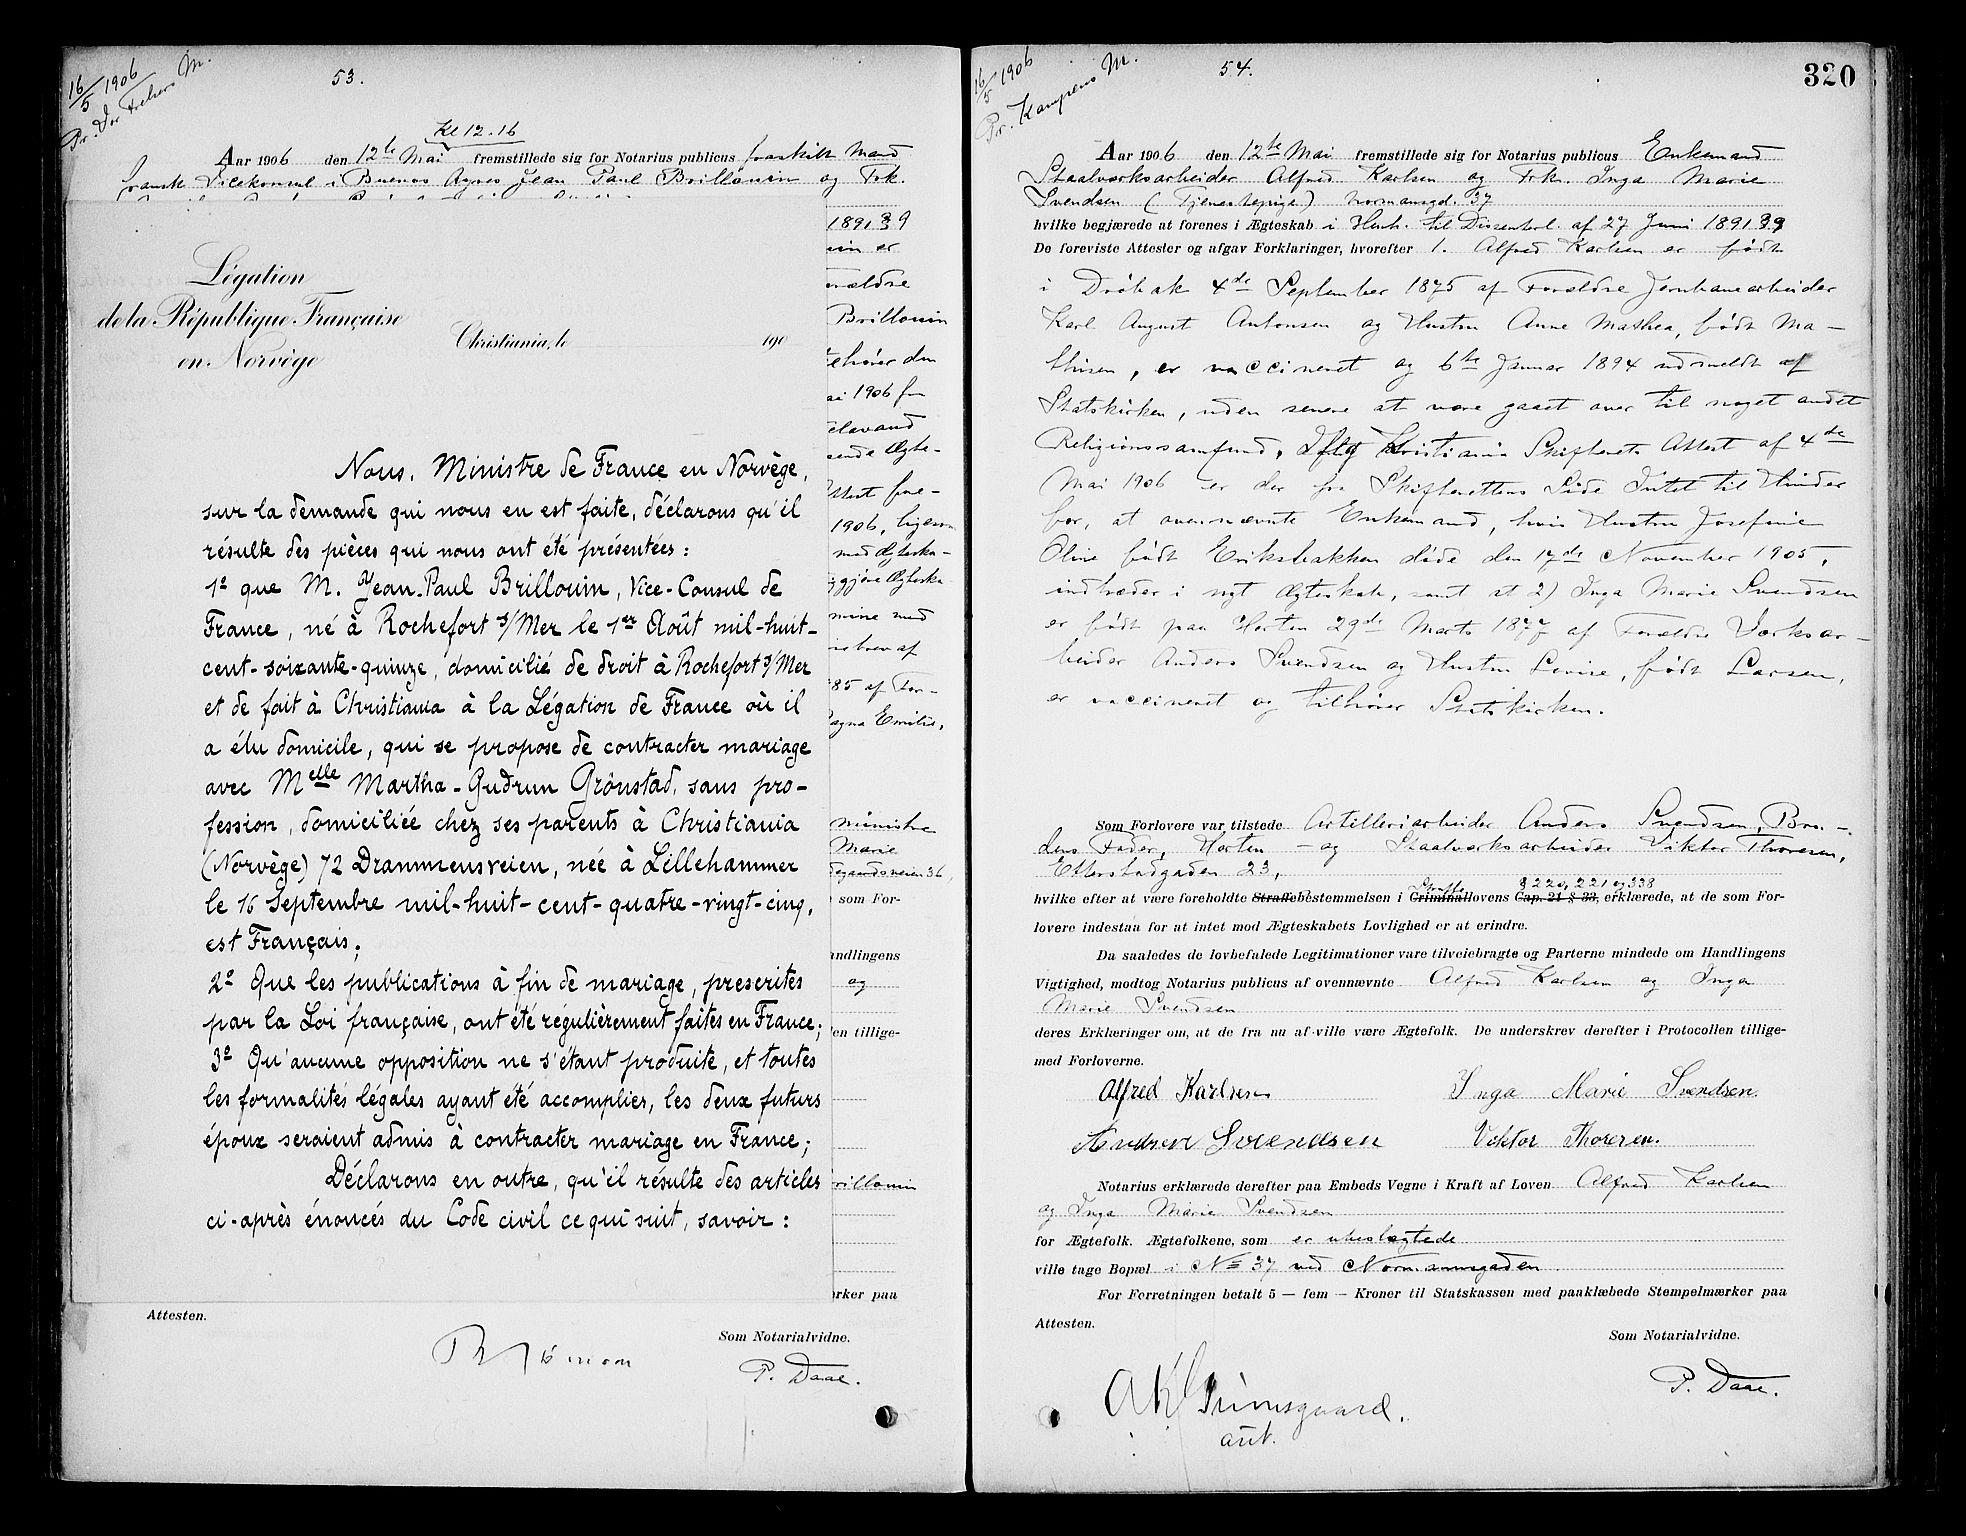 SAO, Oslo byfogd avd. I, L/Lb/Lbb/L0006: Notarialprotokoll, rekke II: Vigsler, 1902-1907, s. 319b-320a